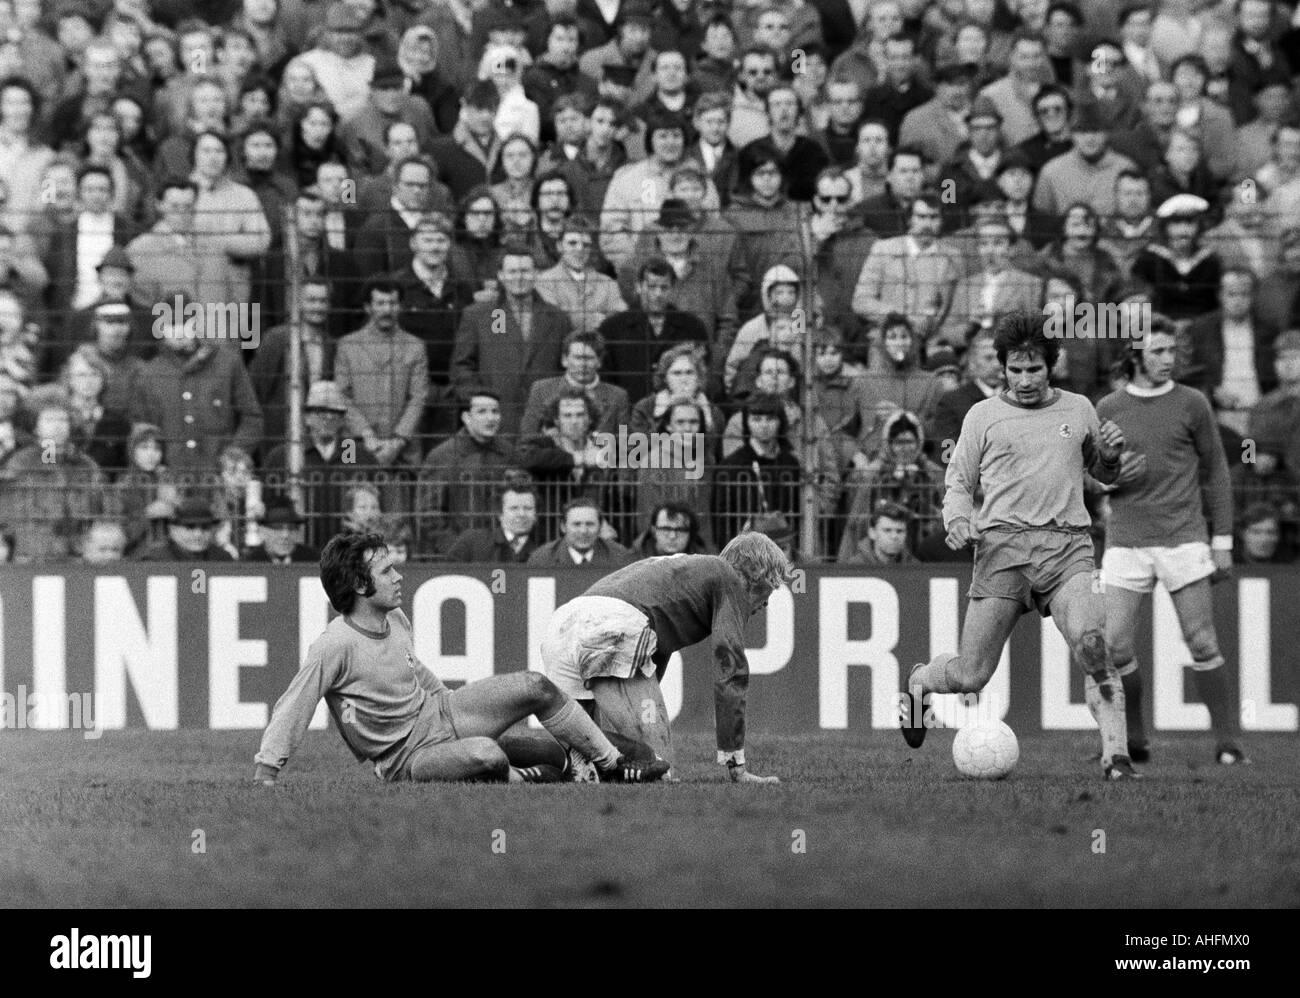 football, Bundesliga, 1971/1972, FC Schalke 04 versus Eintracht Brunswick 5:1, Glueckaufkampfbahn Stadium in Gelsenkirchen, scene of the match, f.l.t.r. Ludwig Bruendl (BS), Rolf Ruessmann (S04), Klaus Gerwien (BS), Paul Holz (S04) - Stock Image